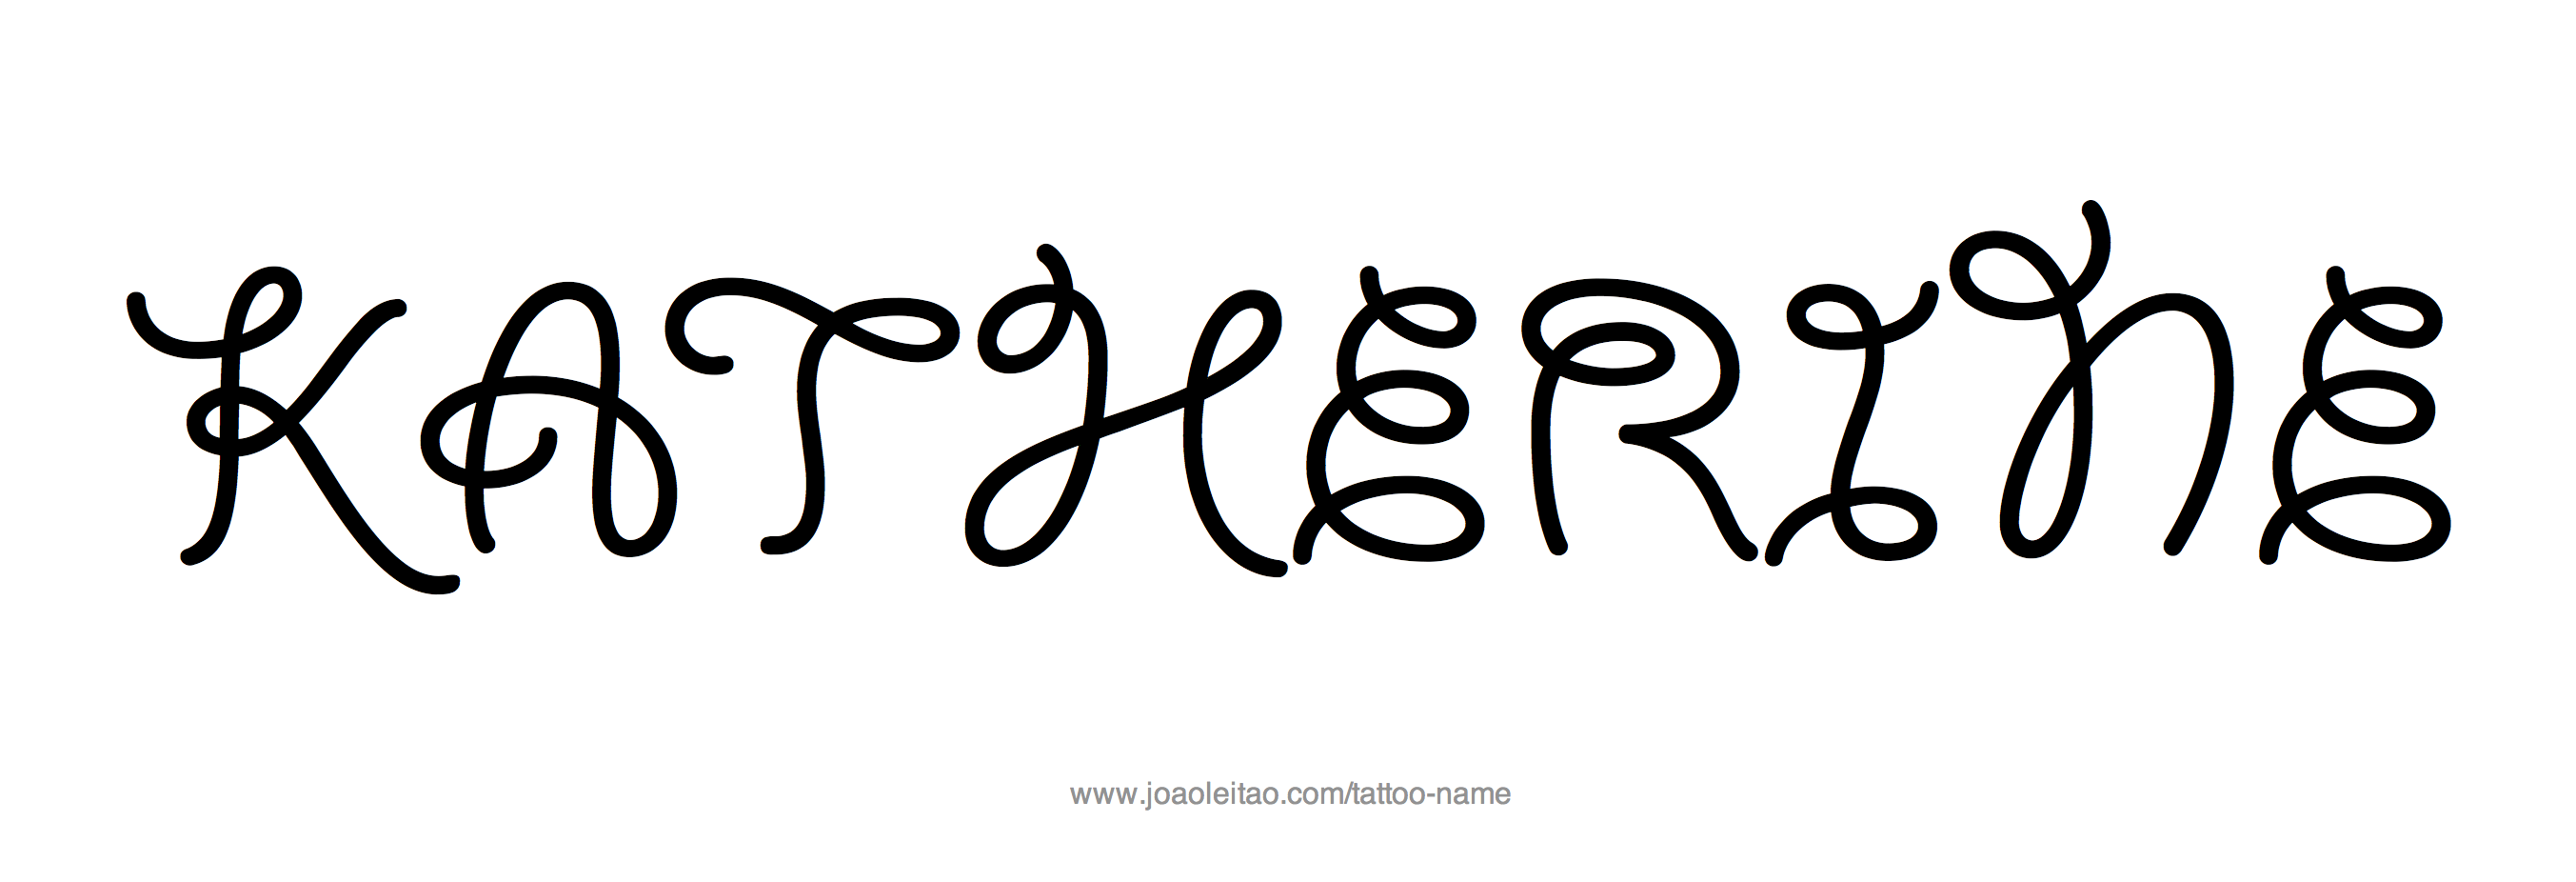 Tattoo Design Name Katherine